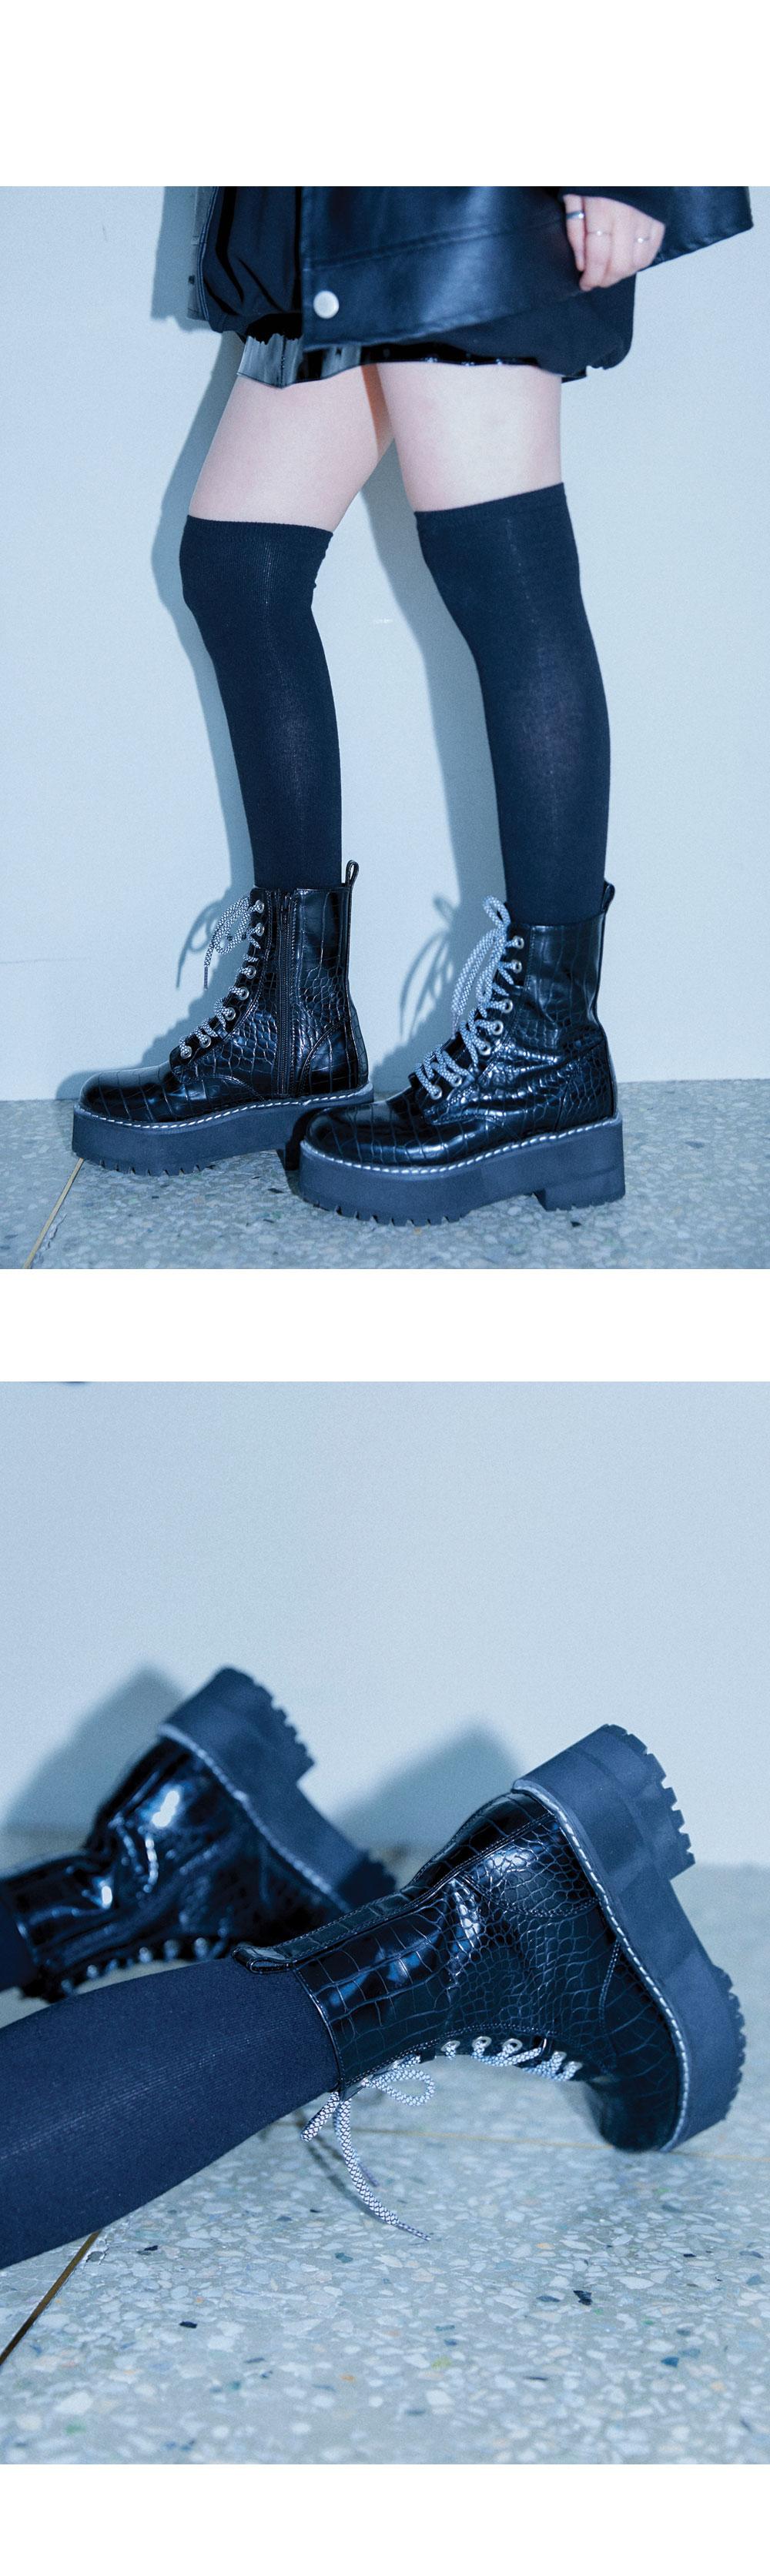 leather stitch pattern walker boots